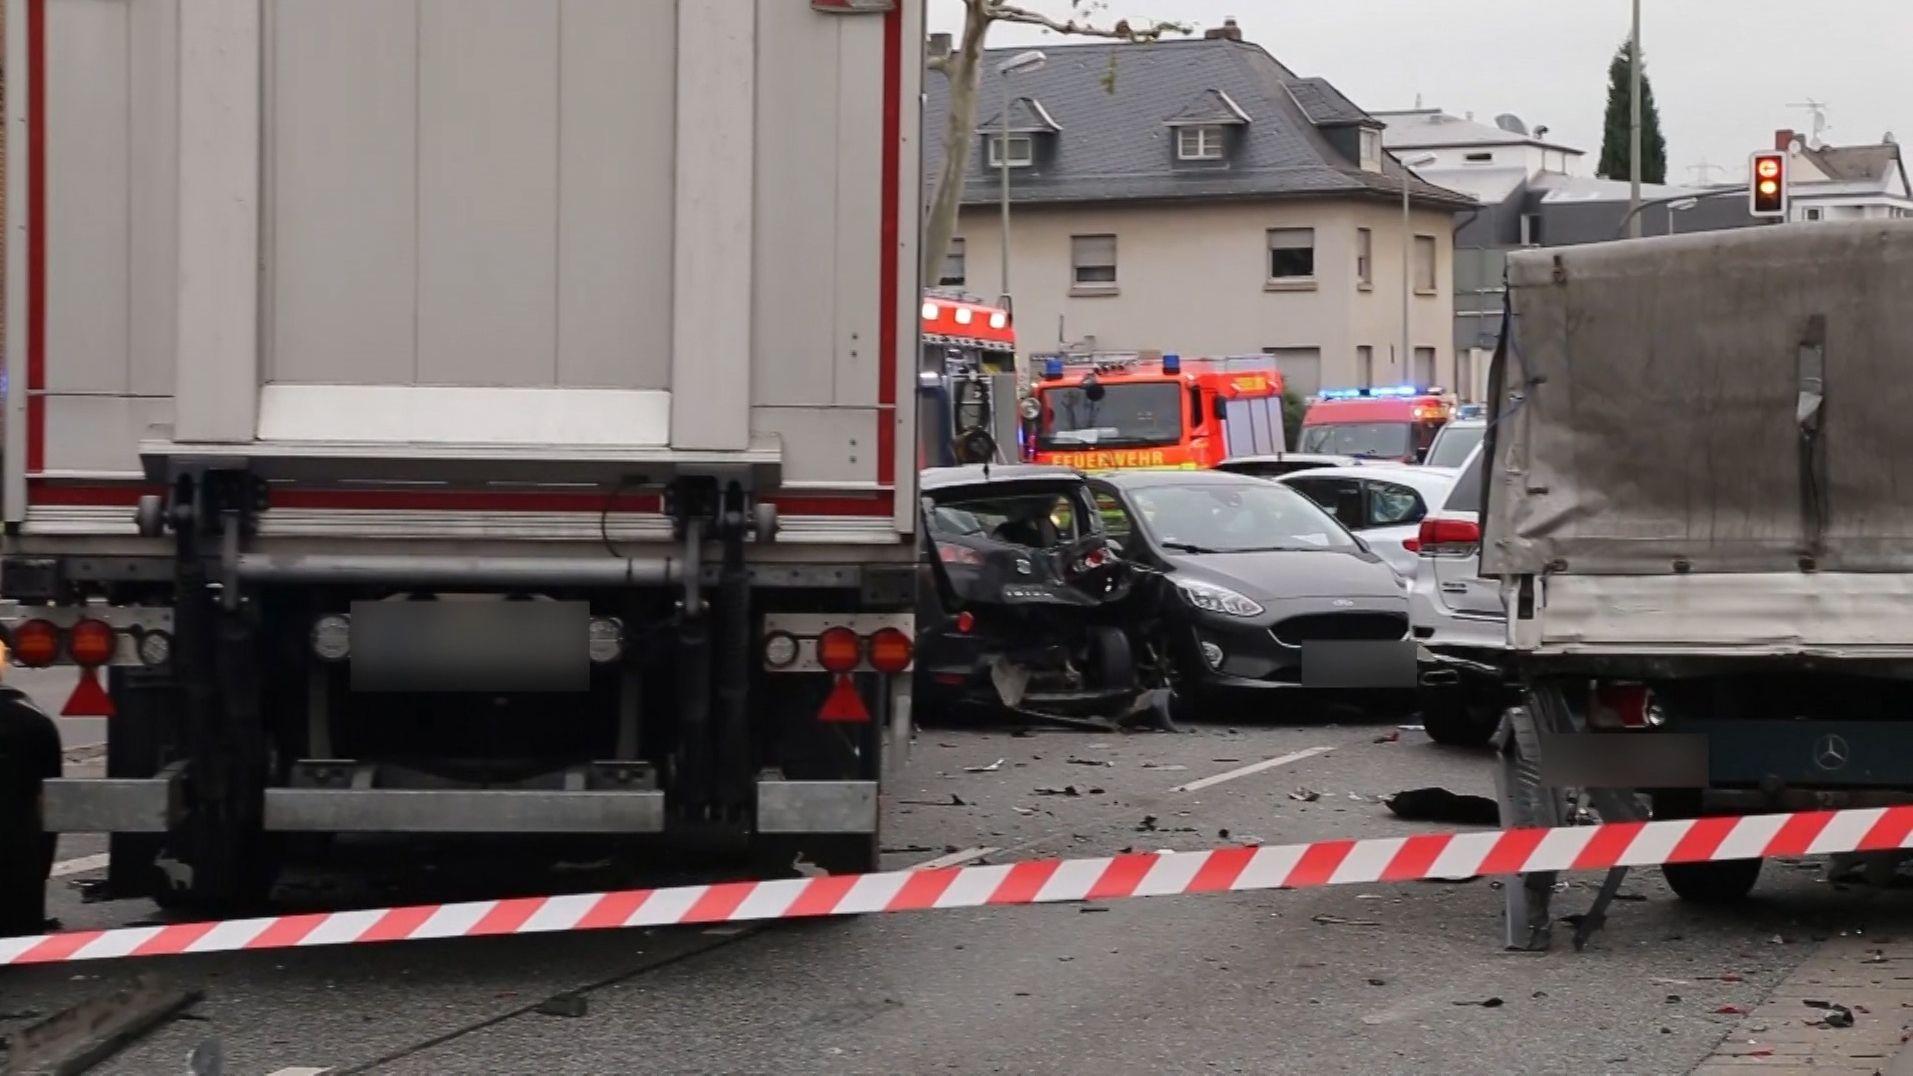 Gestohlener Lkw: Unfallstelle in Limburg